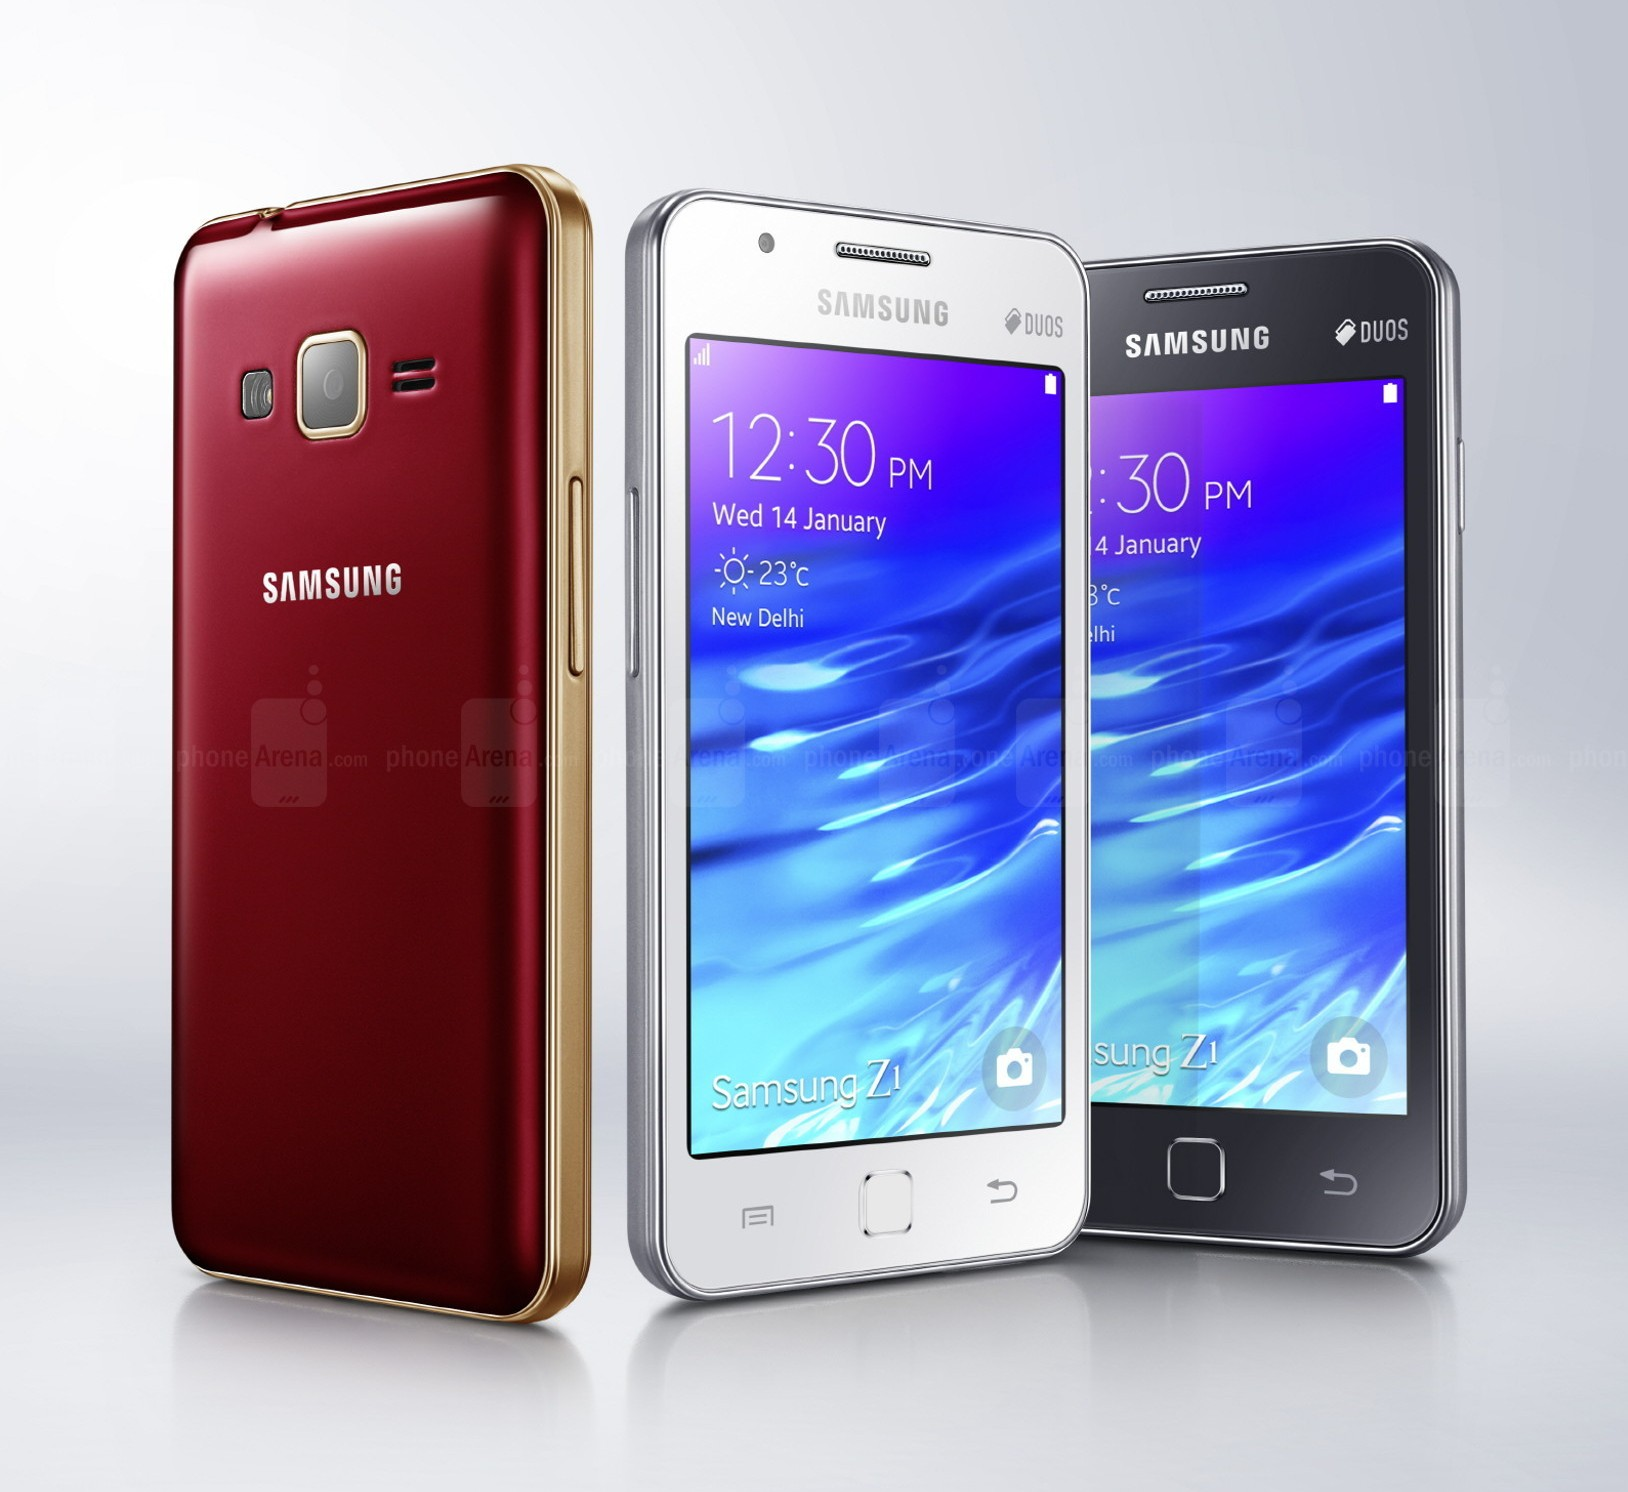 Samsung Z1 2 e1457715617484